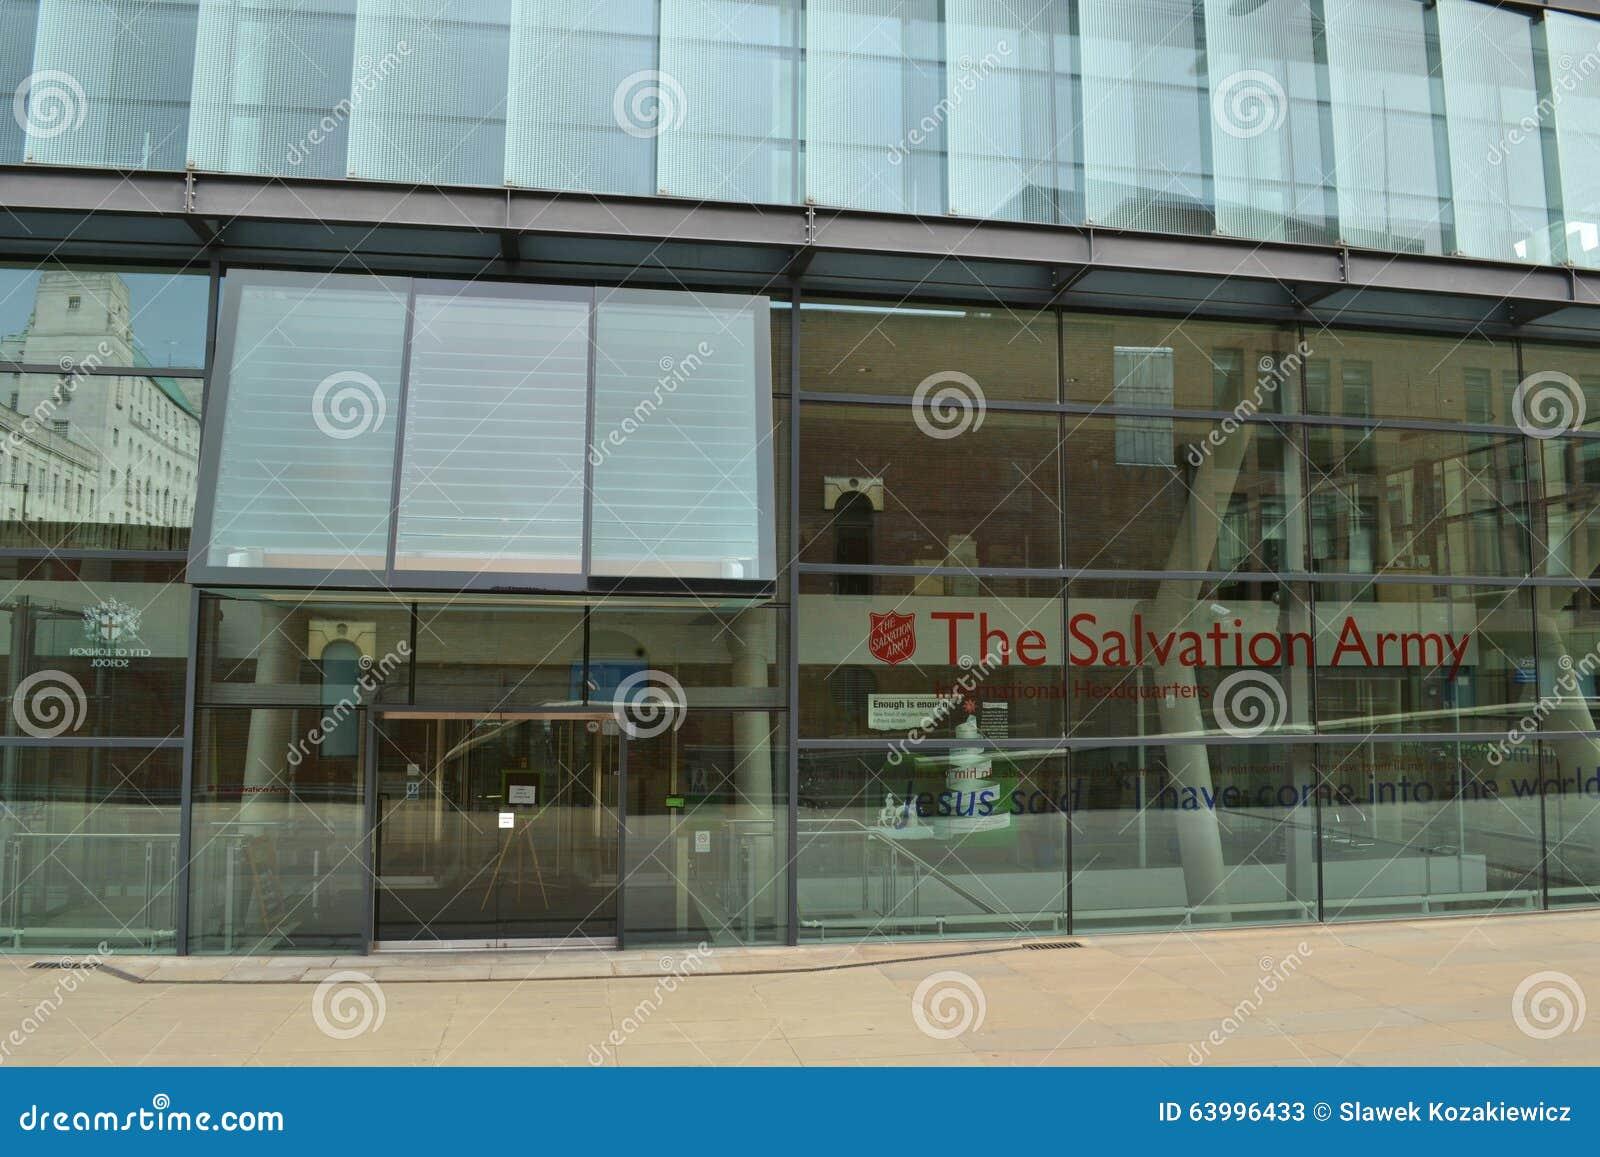 Google Hoofdkwartier Londen : Leger des heils internationaal hoofdkwartier londen redactionele